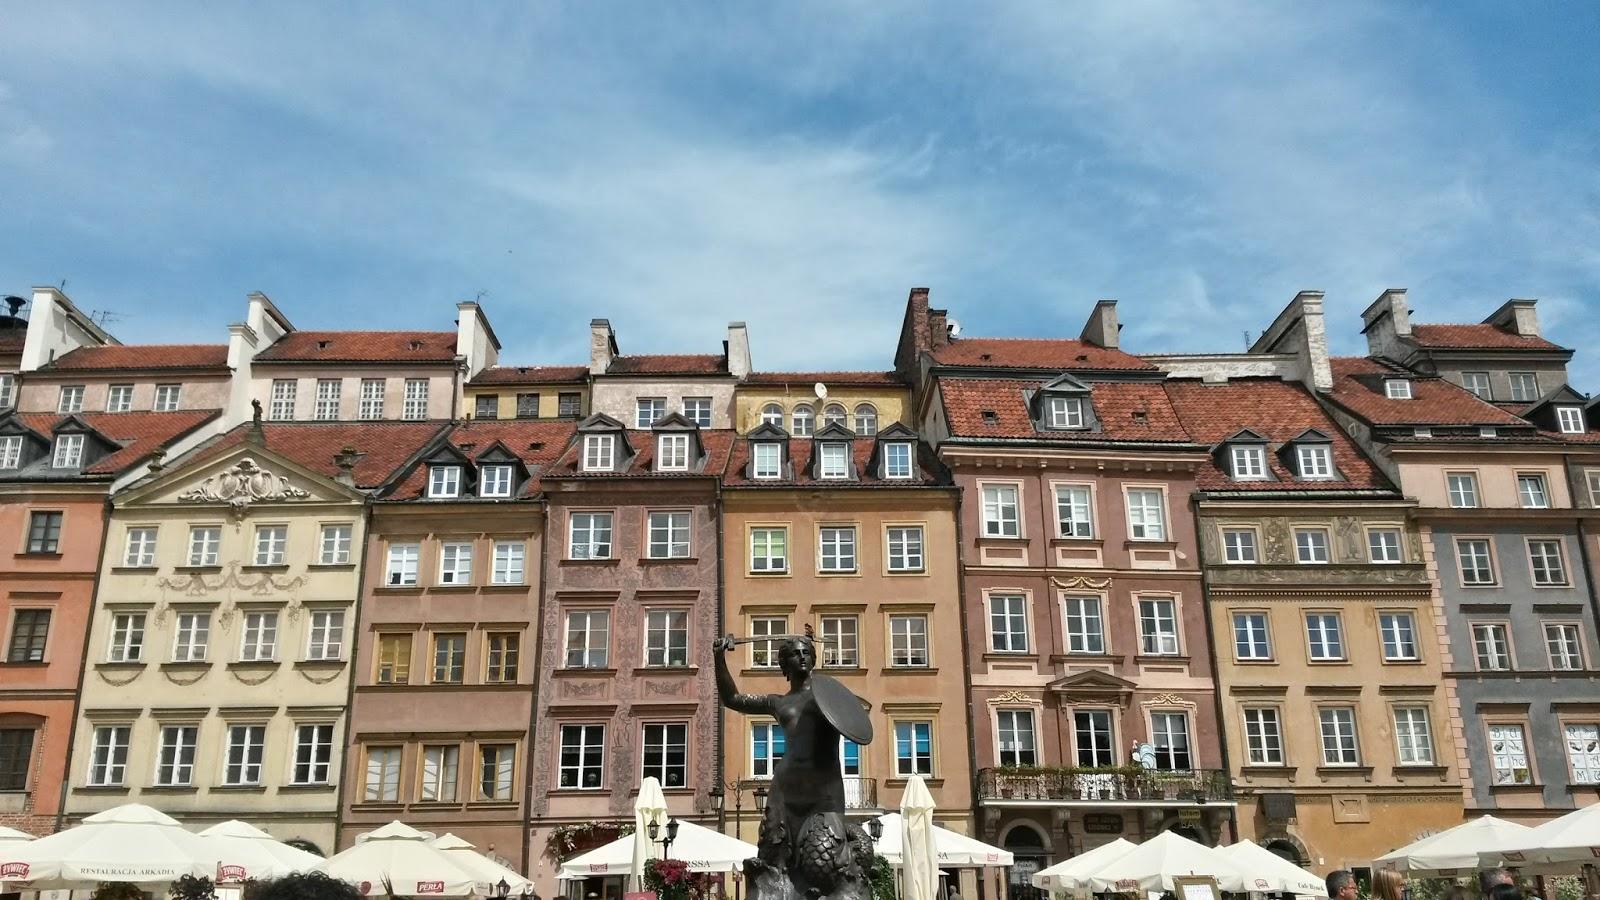 Varşova Polonya Old Town Denizkızı warsaw